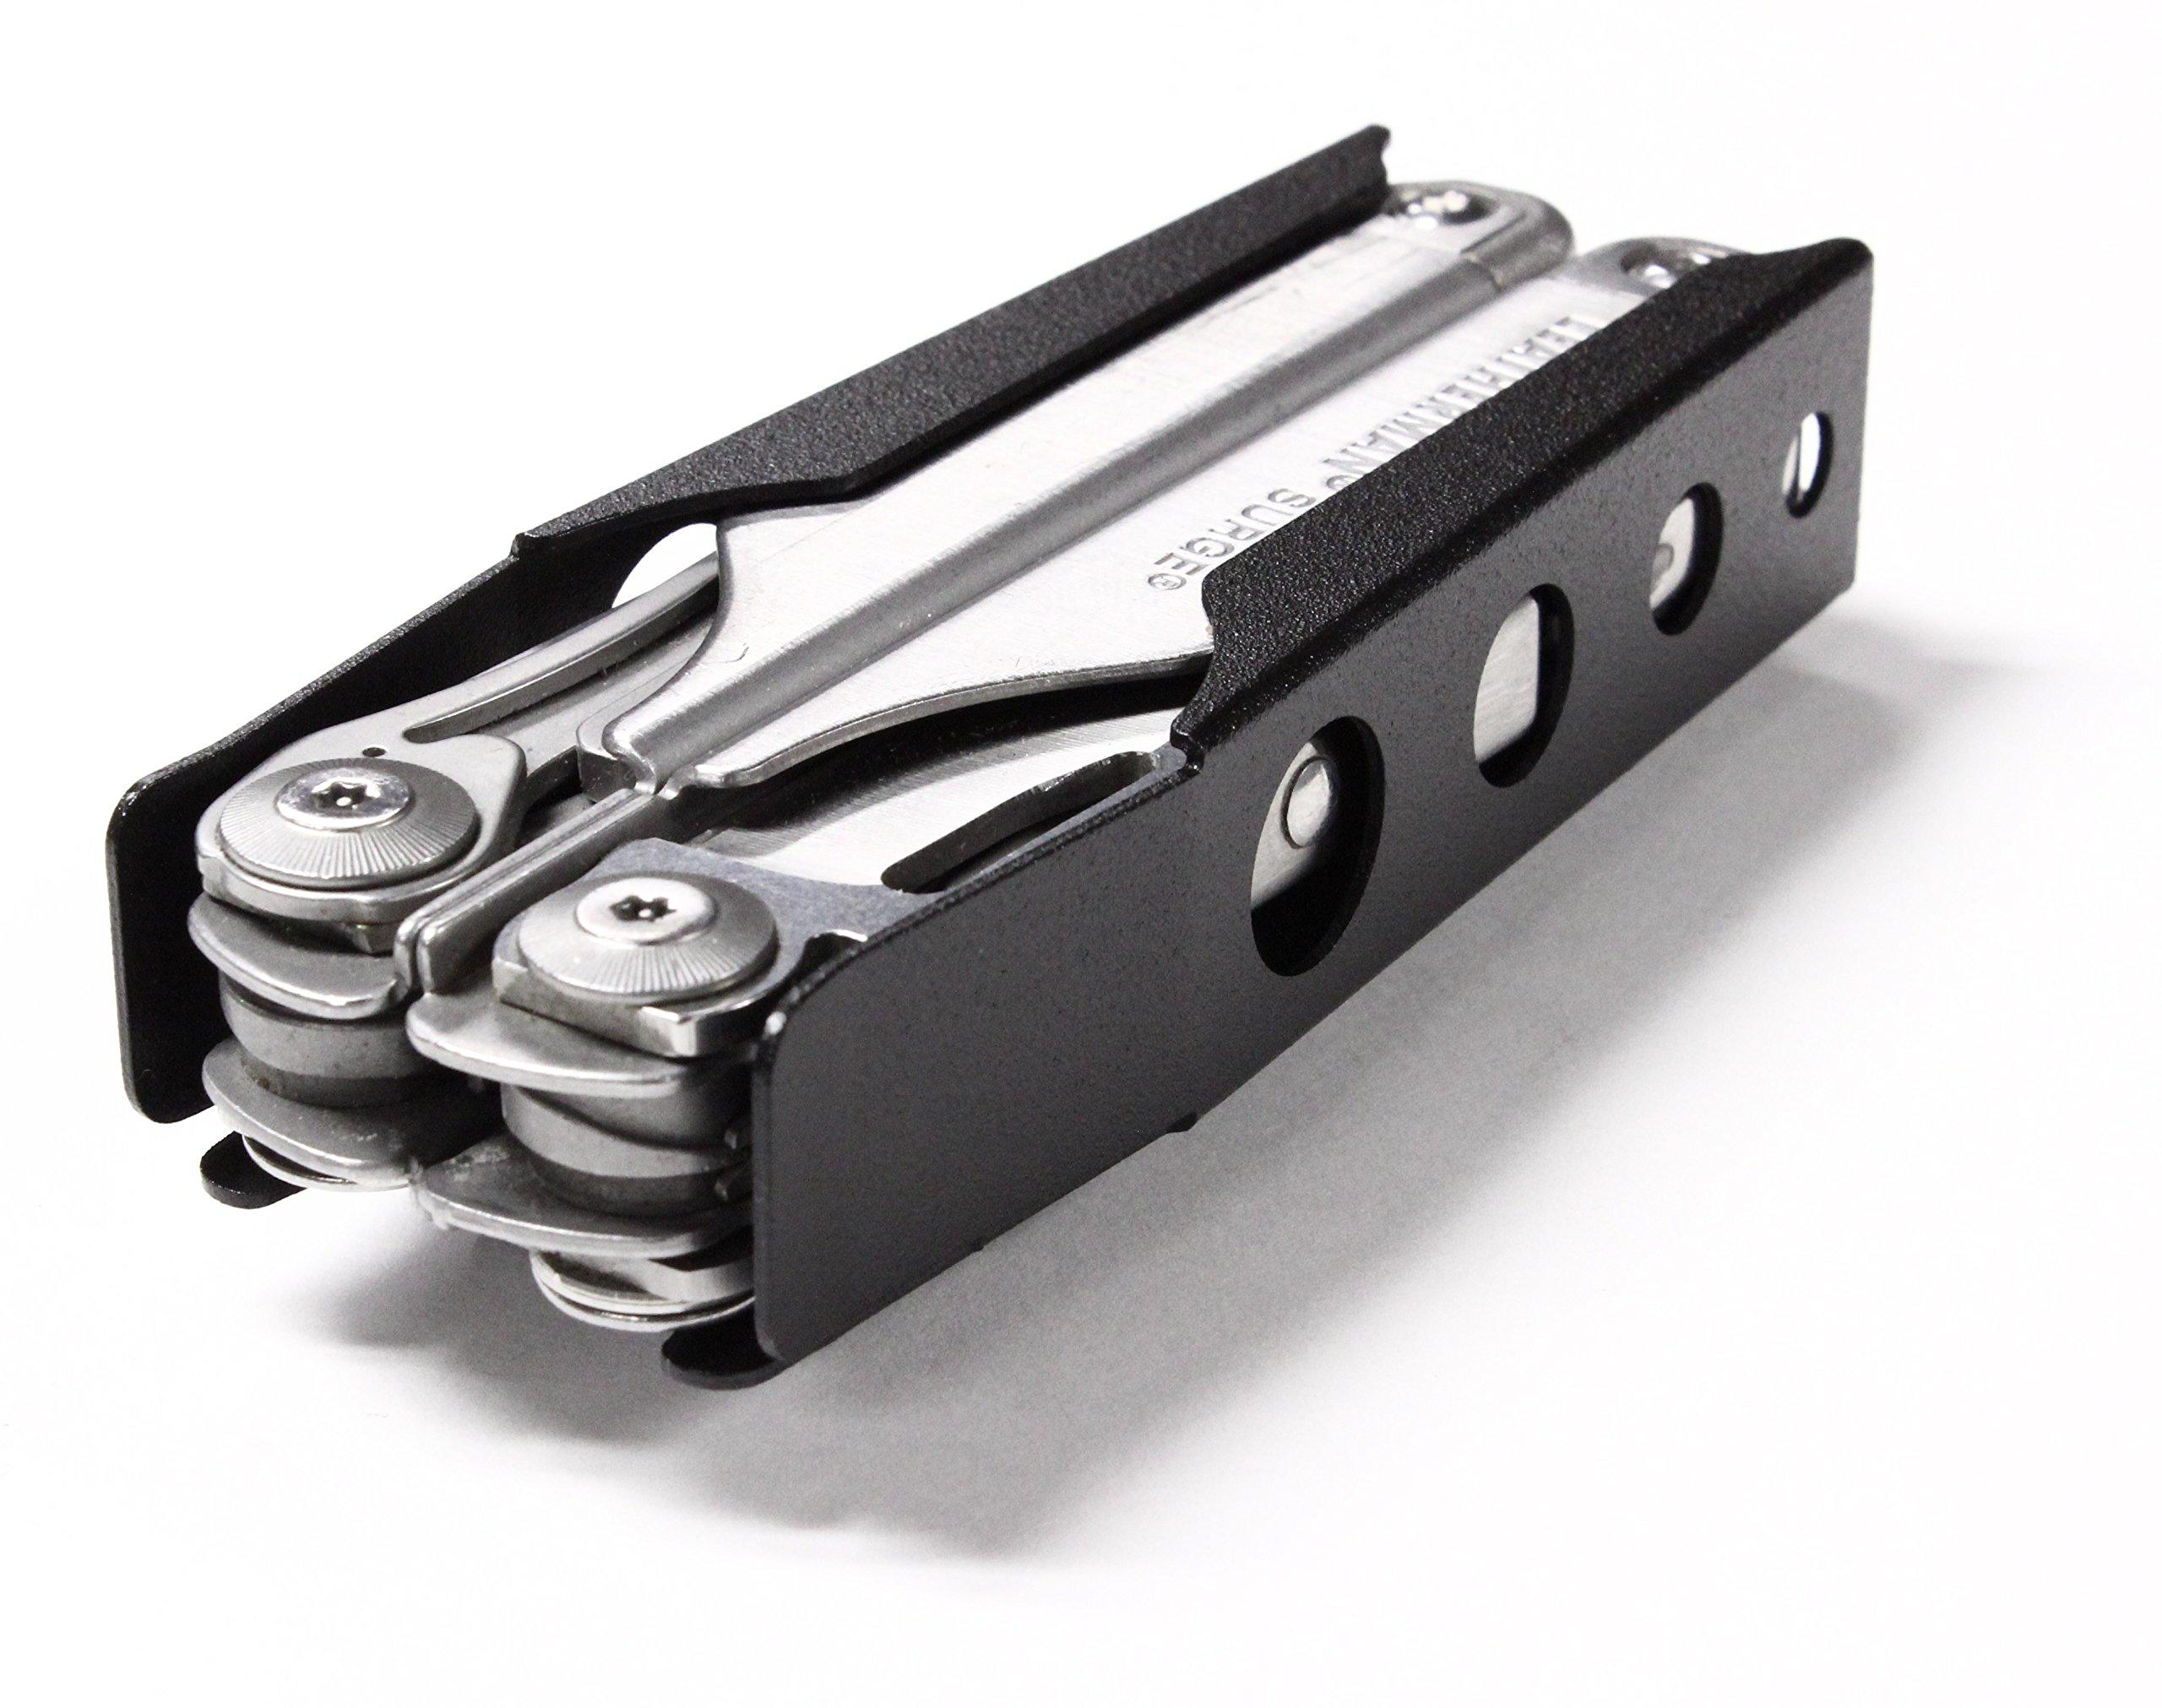 RAE GEAR Surge sheath compatible with Leatherman (1.5'' BELT CLIP)